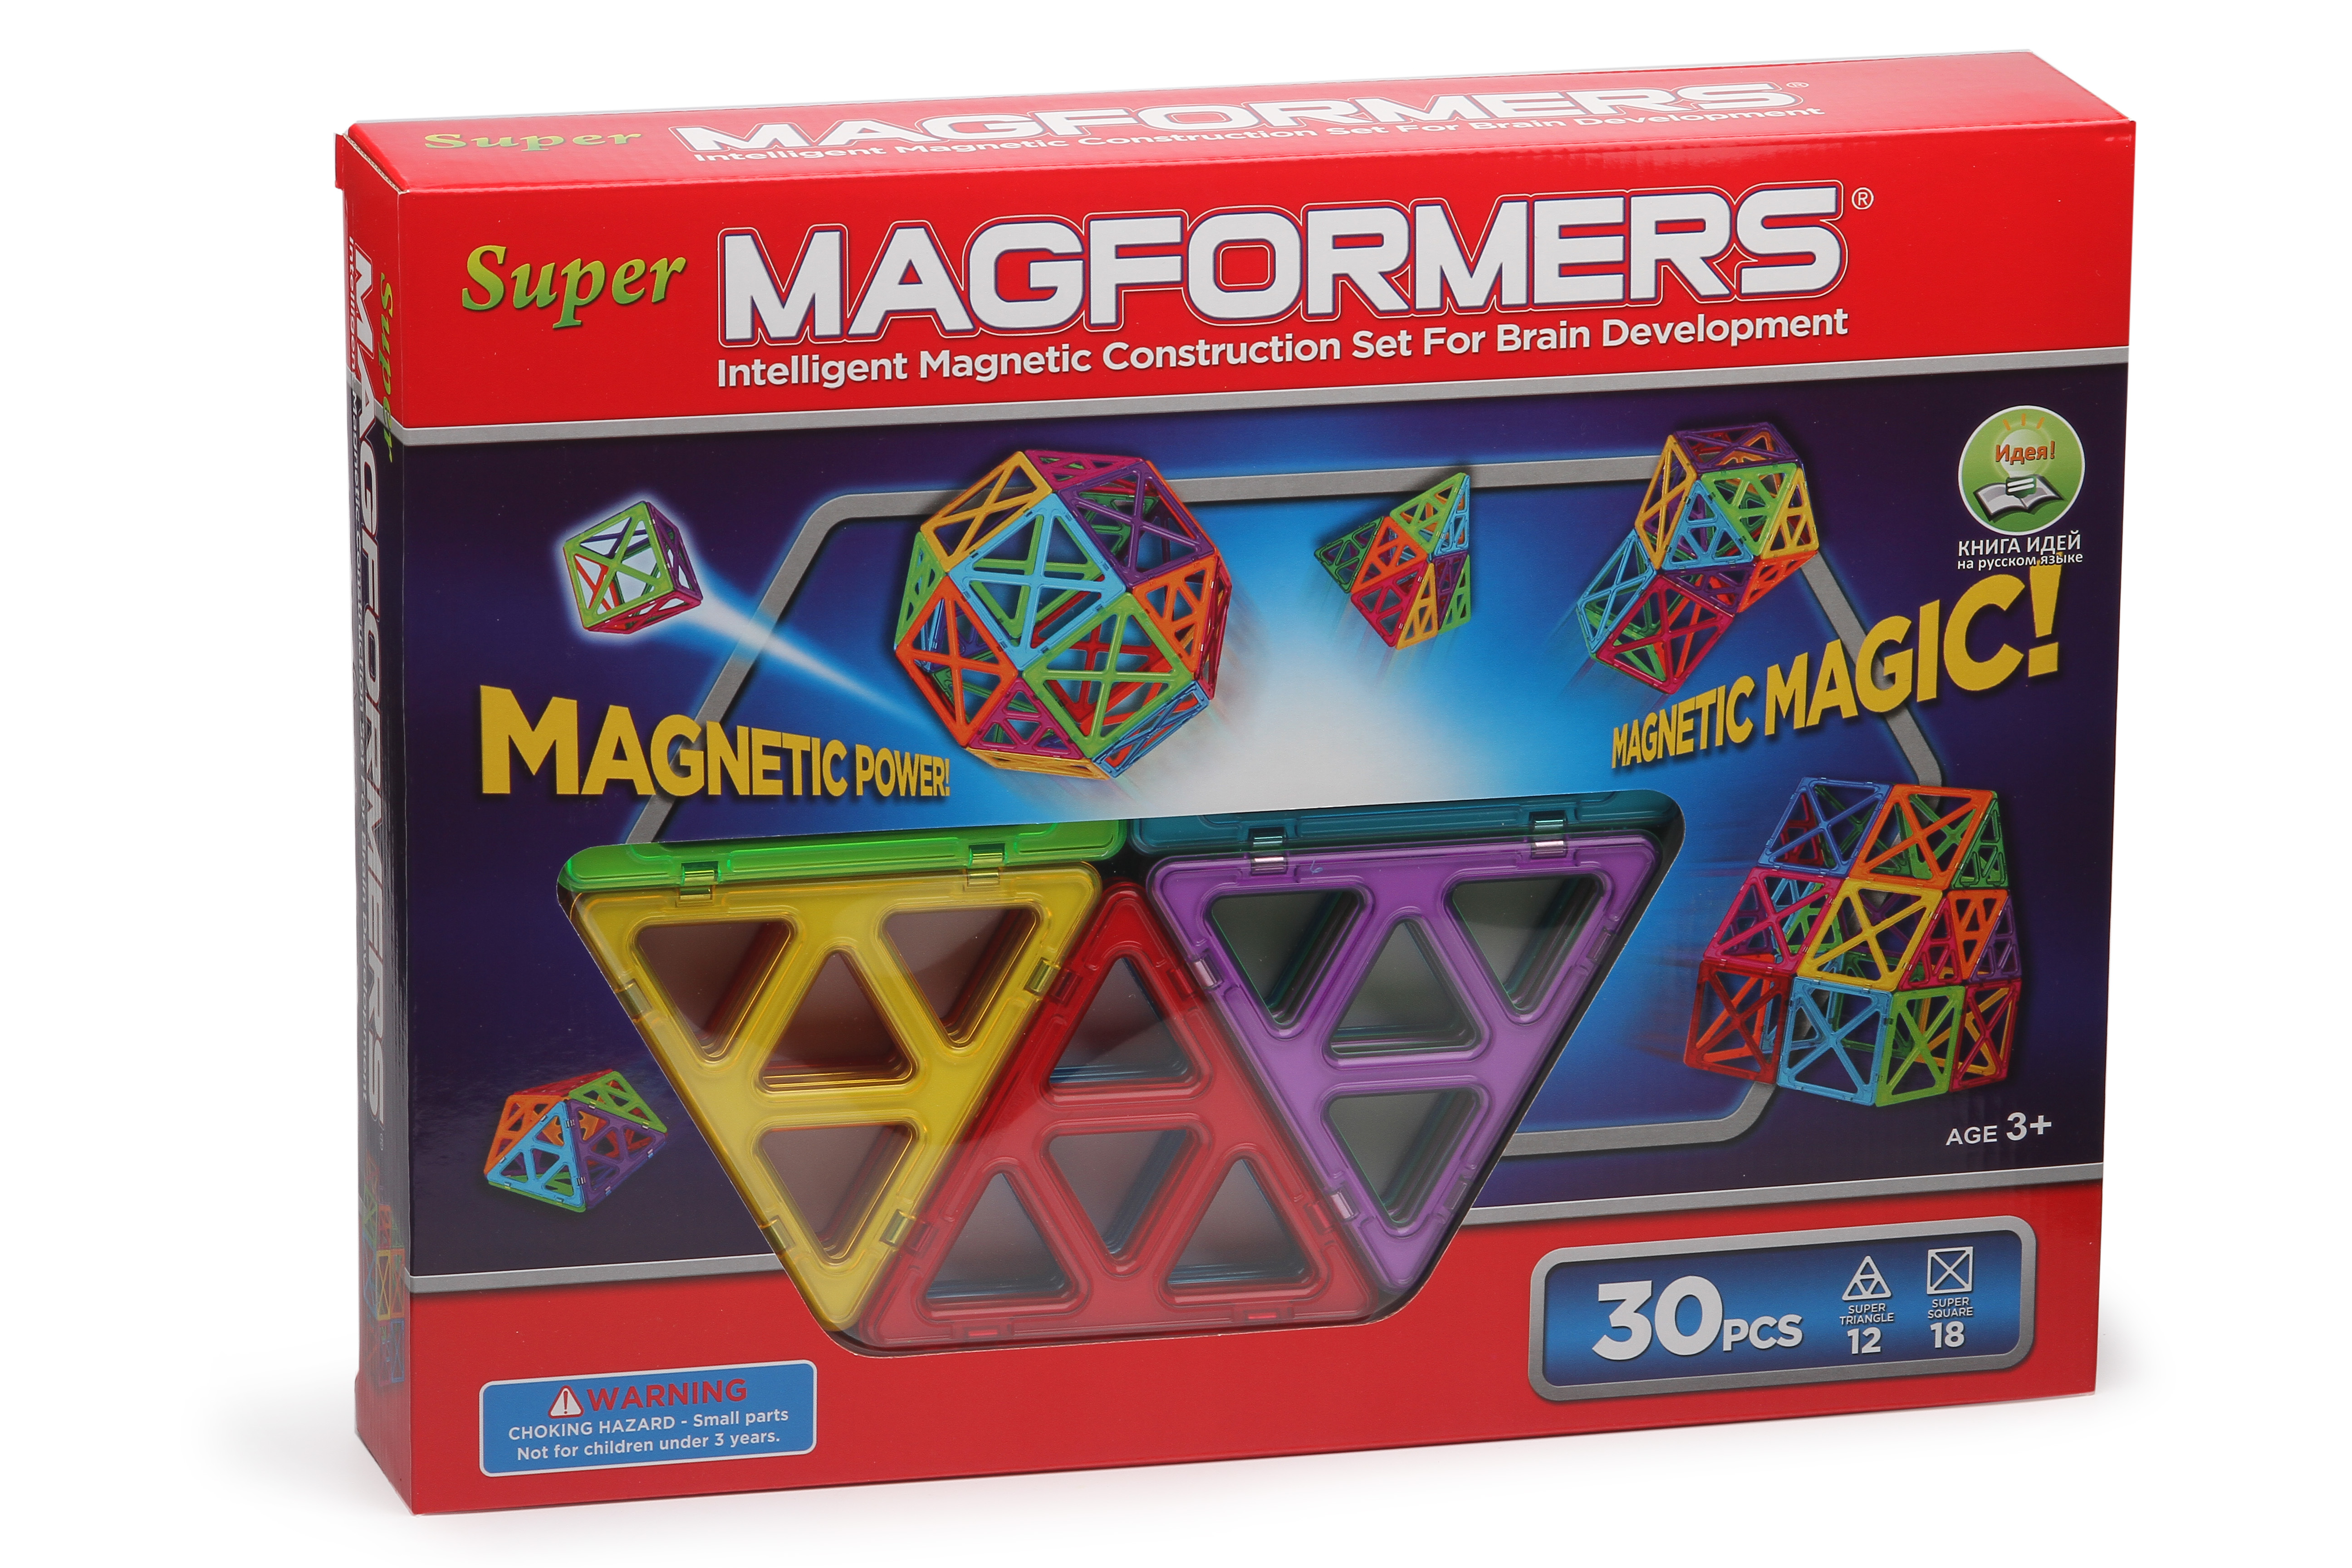 ����������� Magformers Super 30 ���������